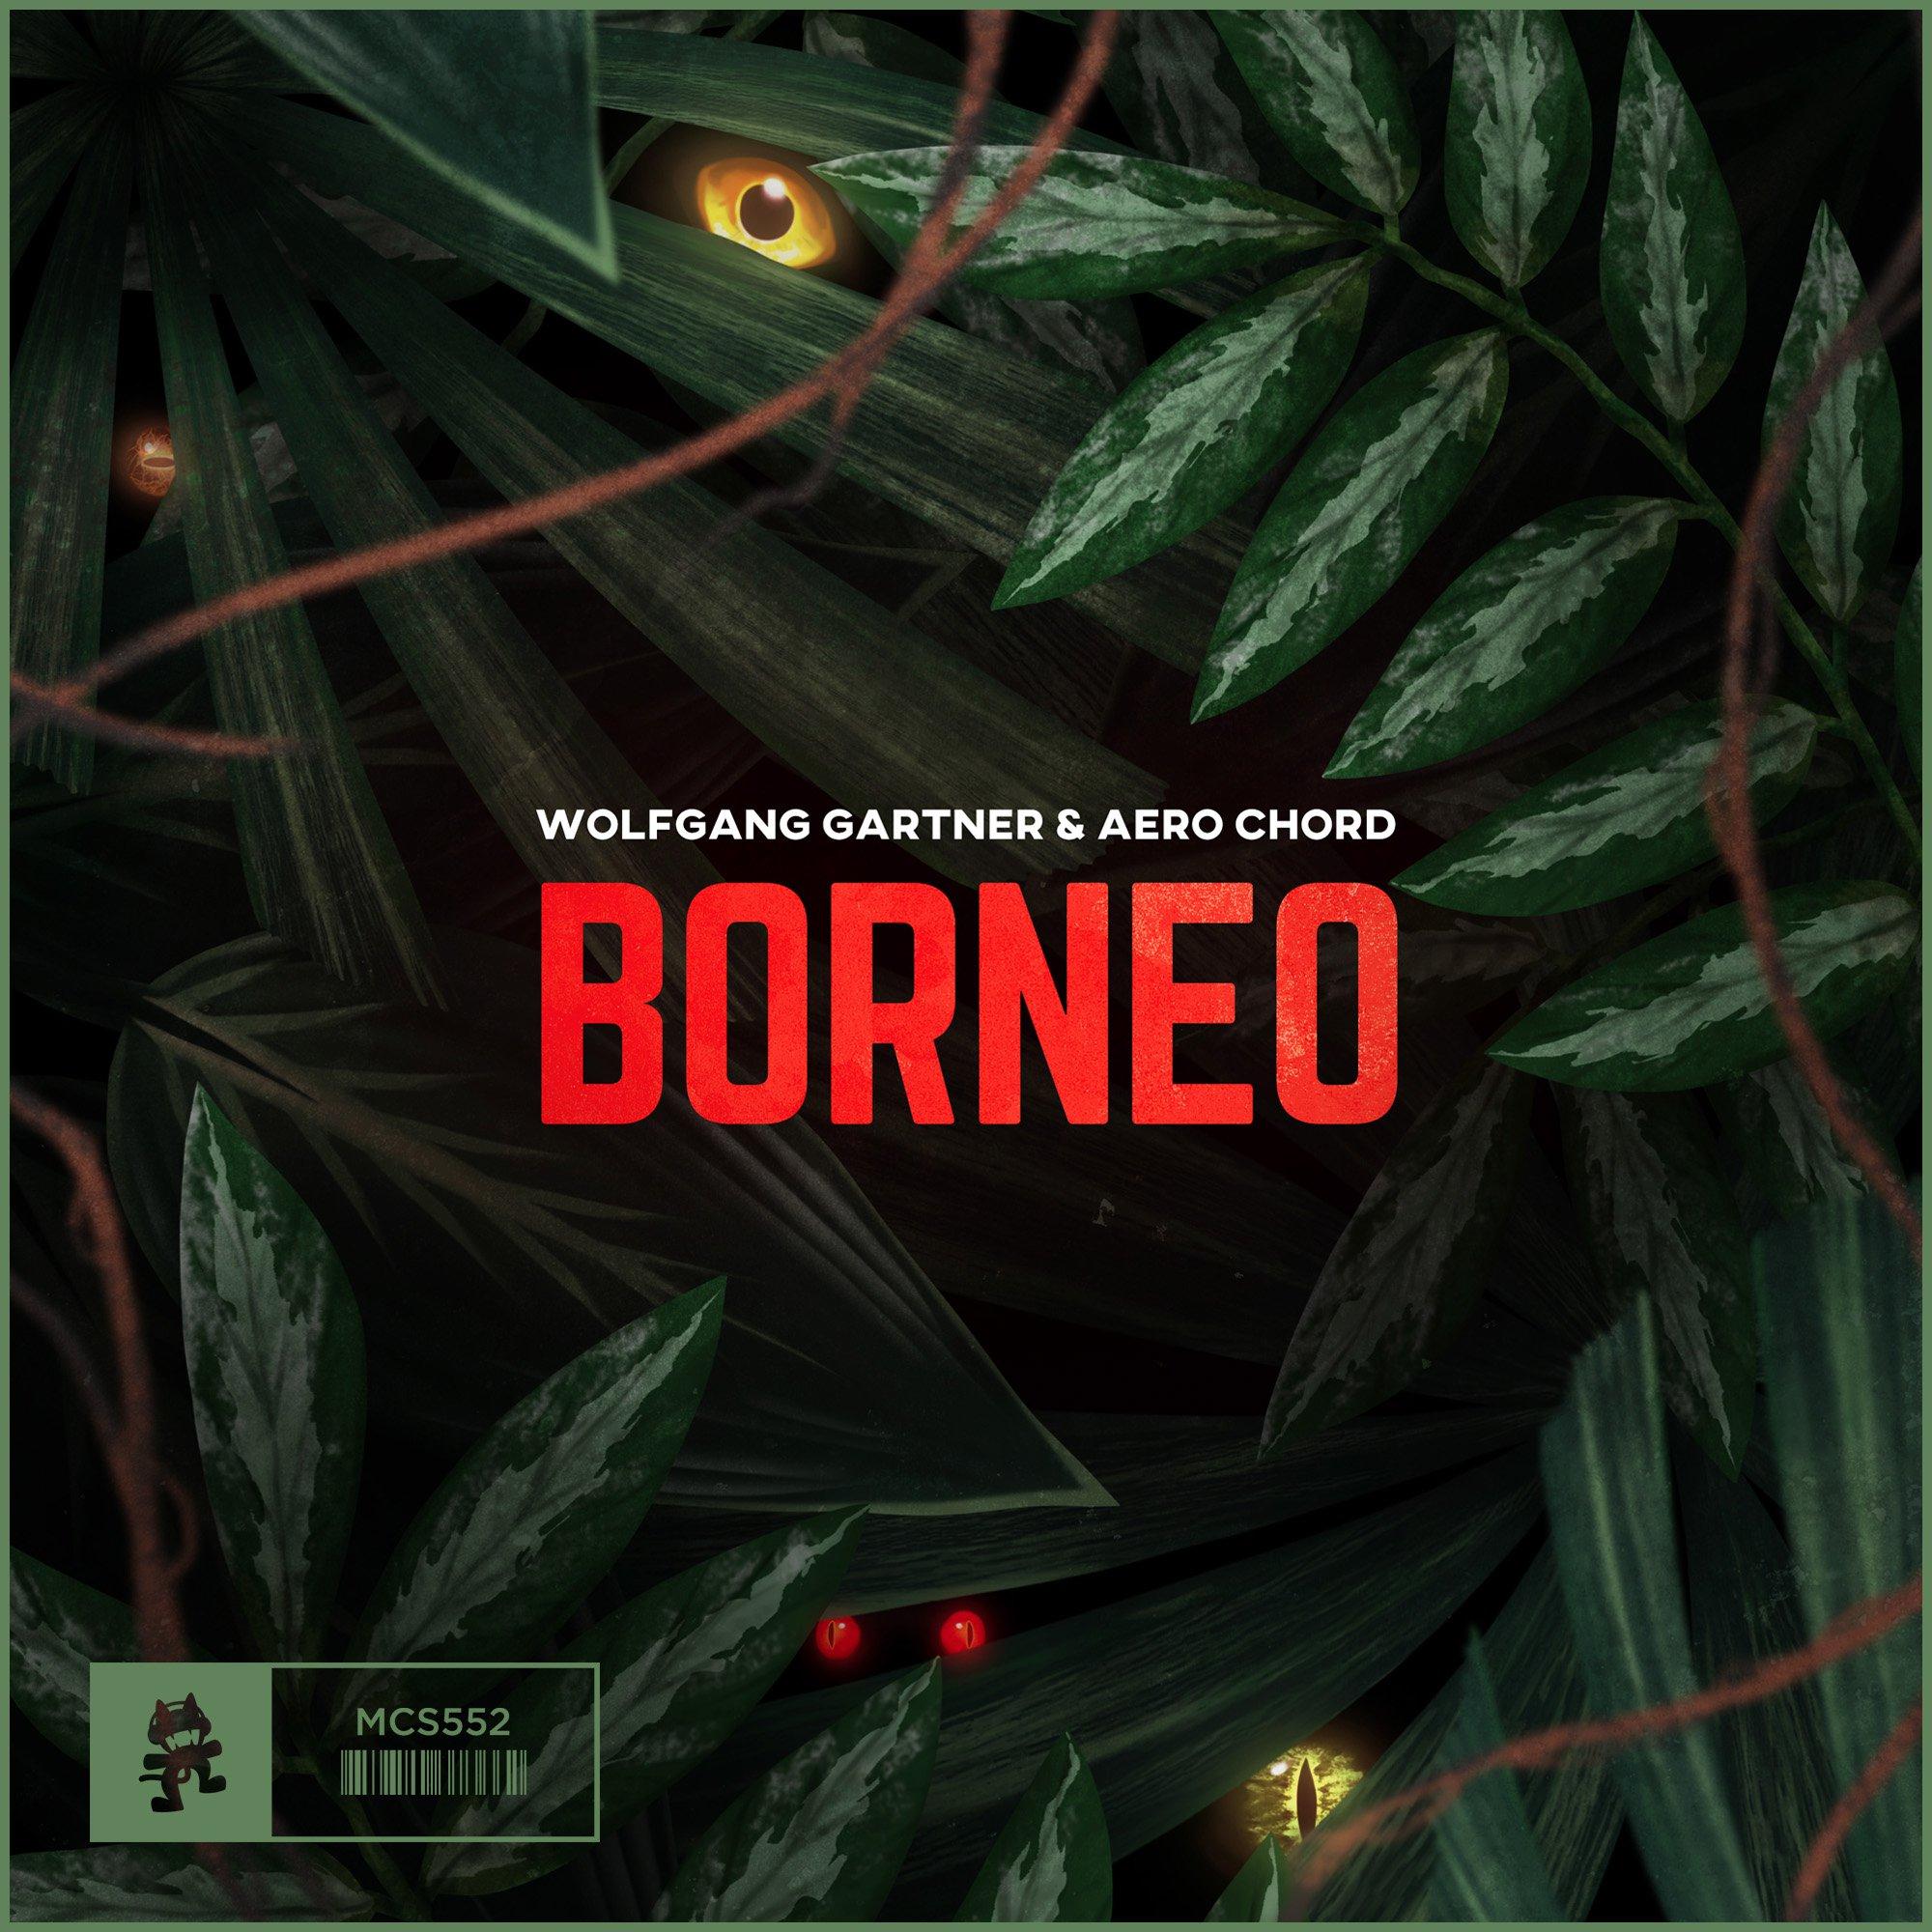 780a987b9e32be Borneo by Wolfgang Gartner   Aero Chord - Monstercat